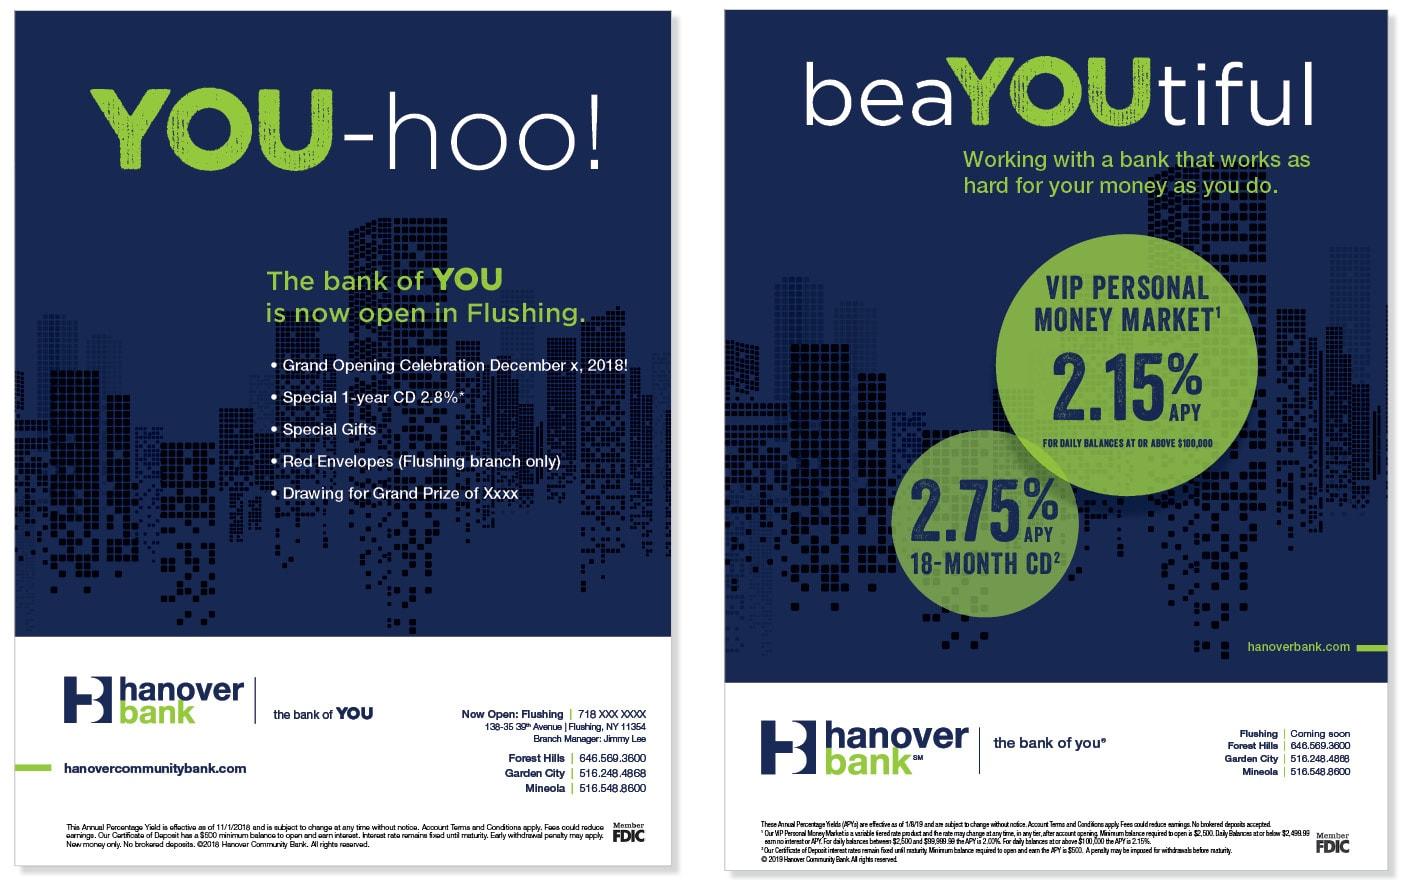 Hanover Bank ads